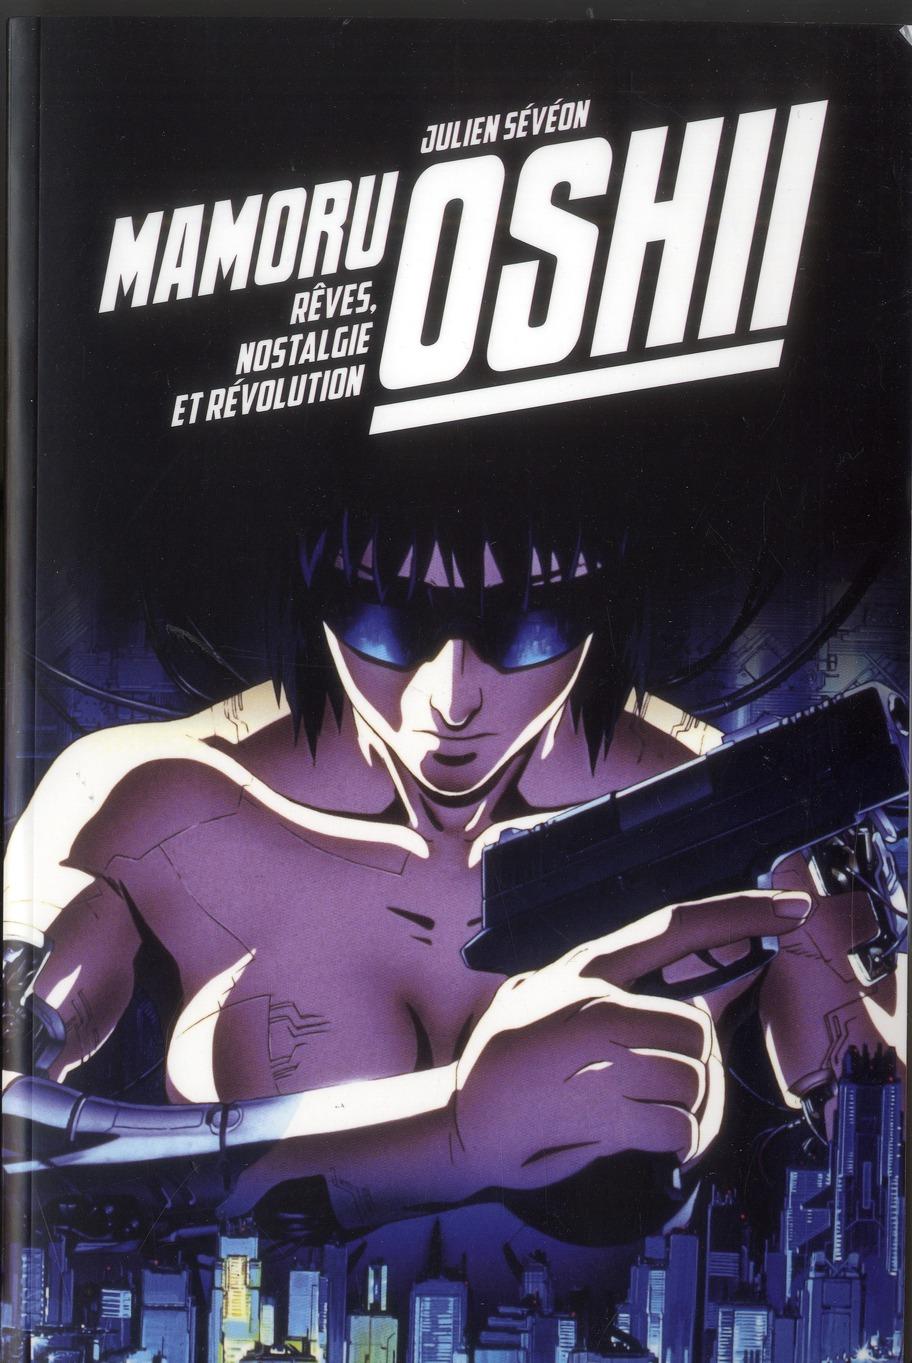 MAMORU OSHII - REVES, NOSTALGIE ET REVOLUTION